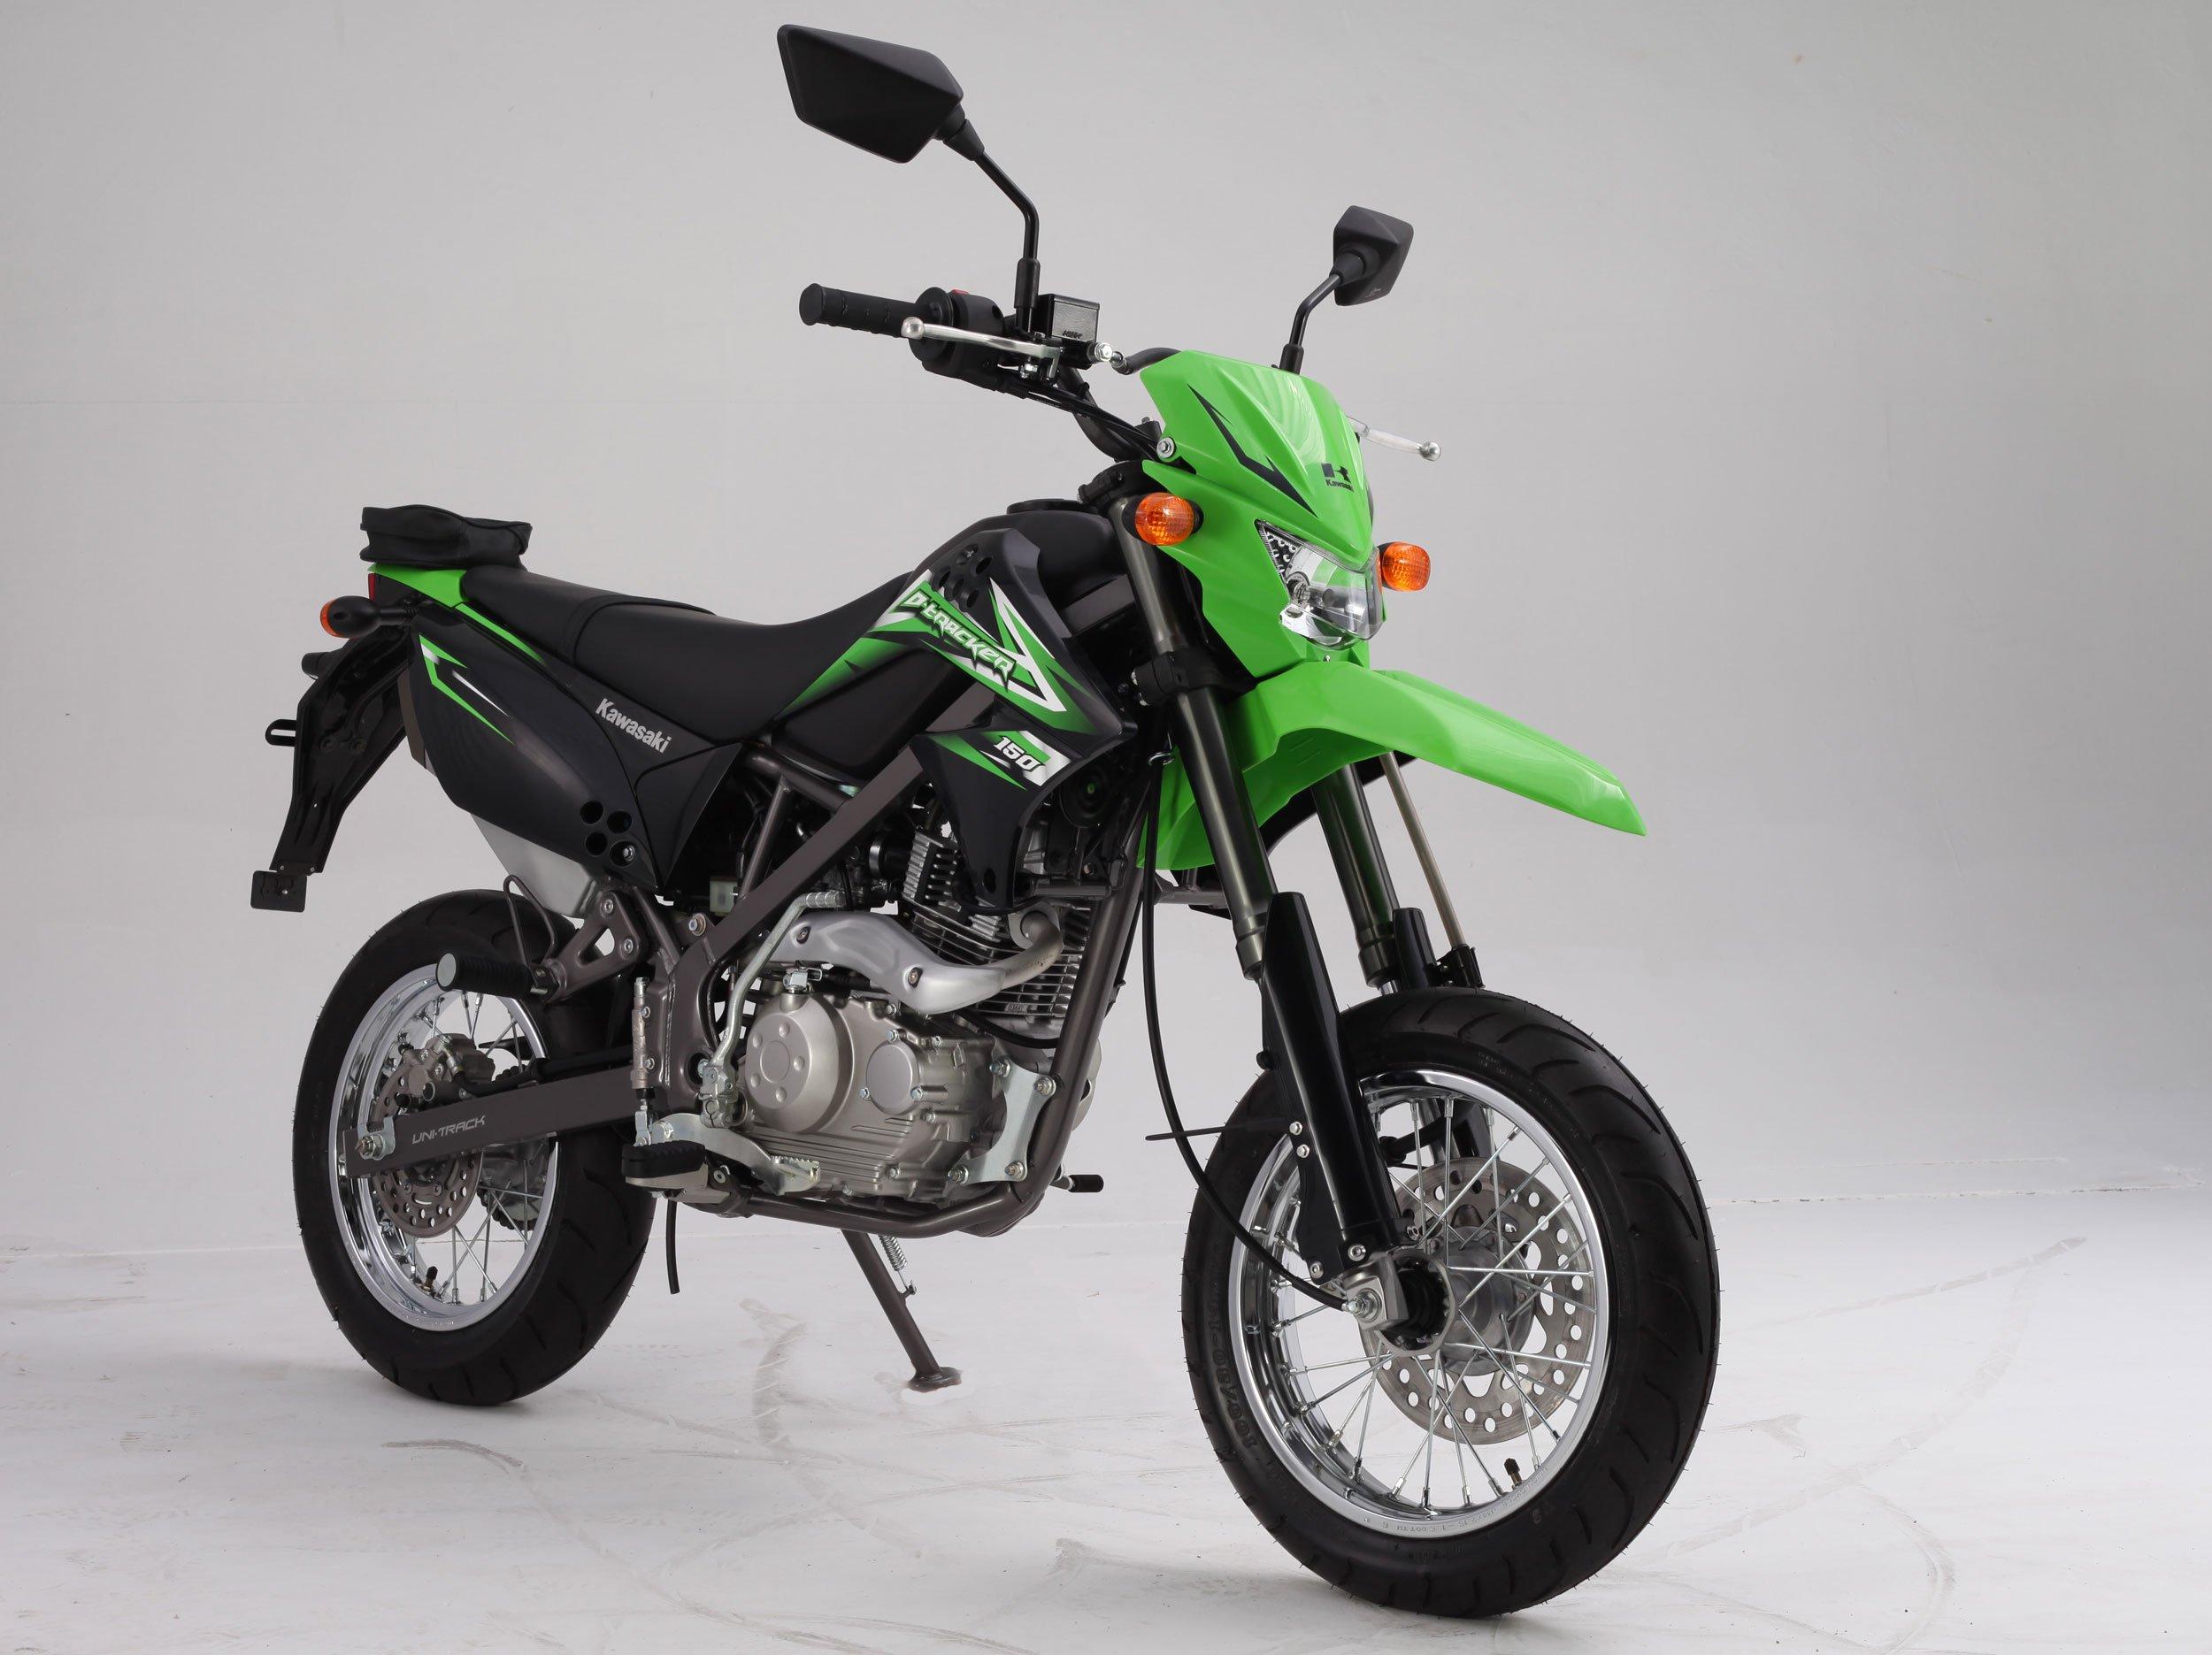 Kawasaki D Tracker 150 Launched Priced At Rm9 689